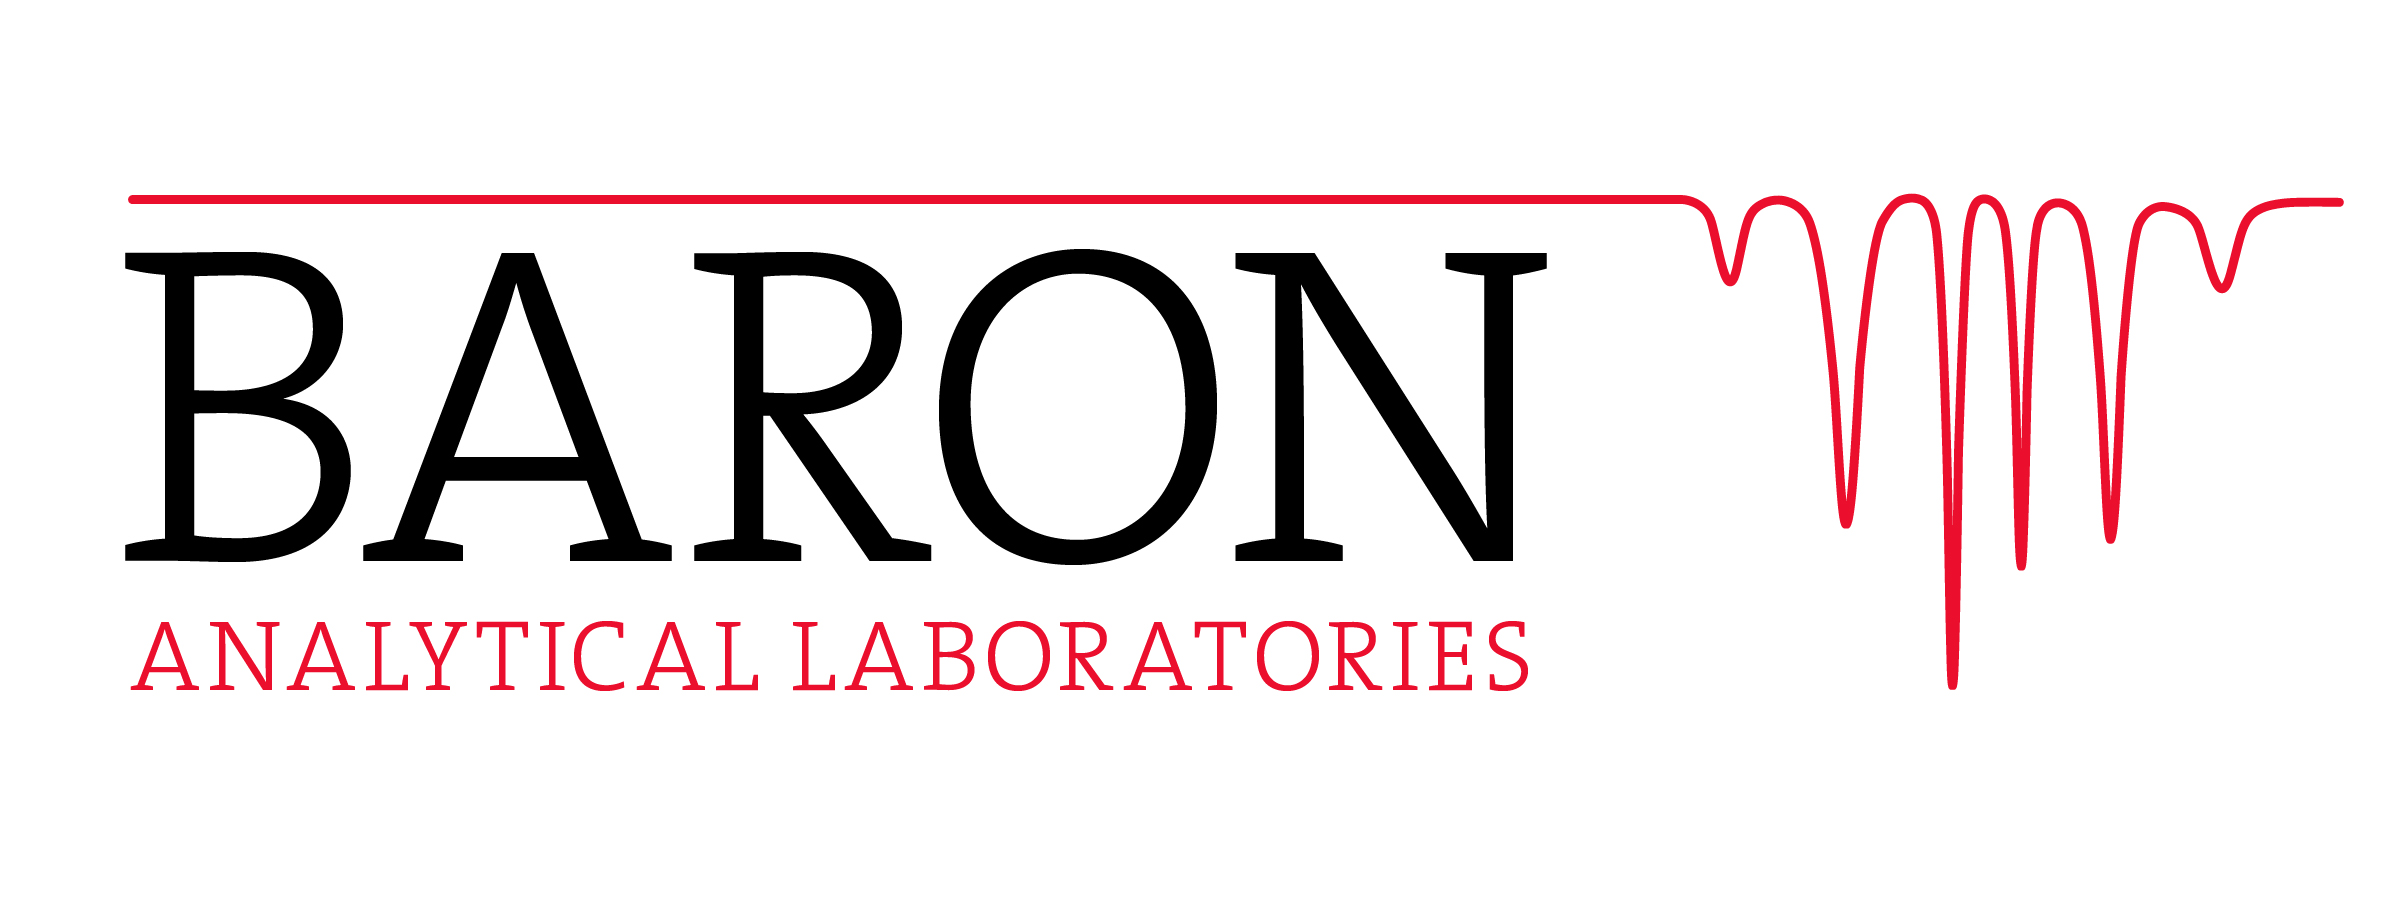 Baron Analytical Laboratories LLC